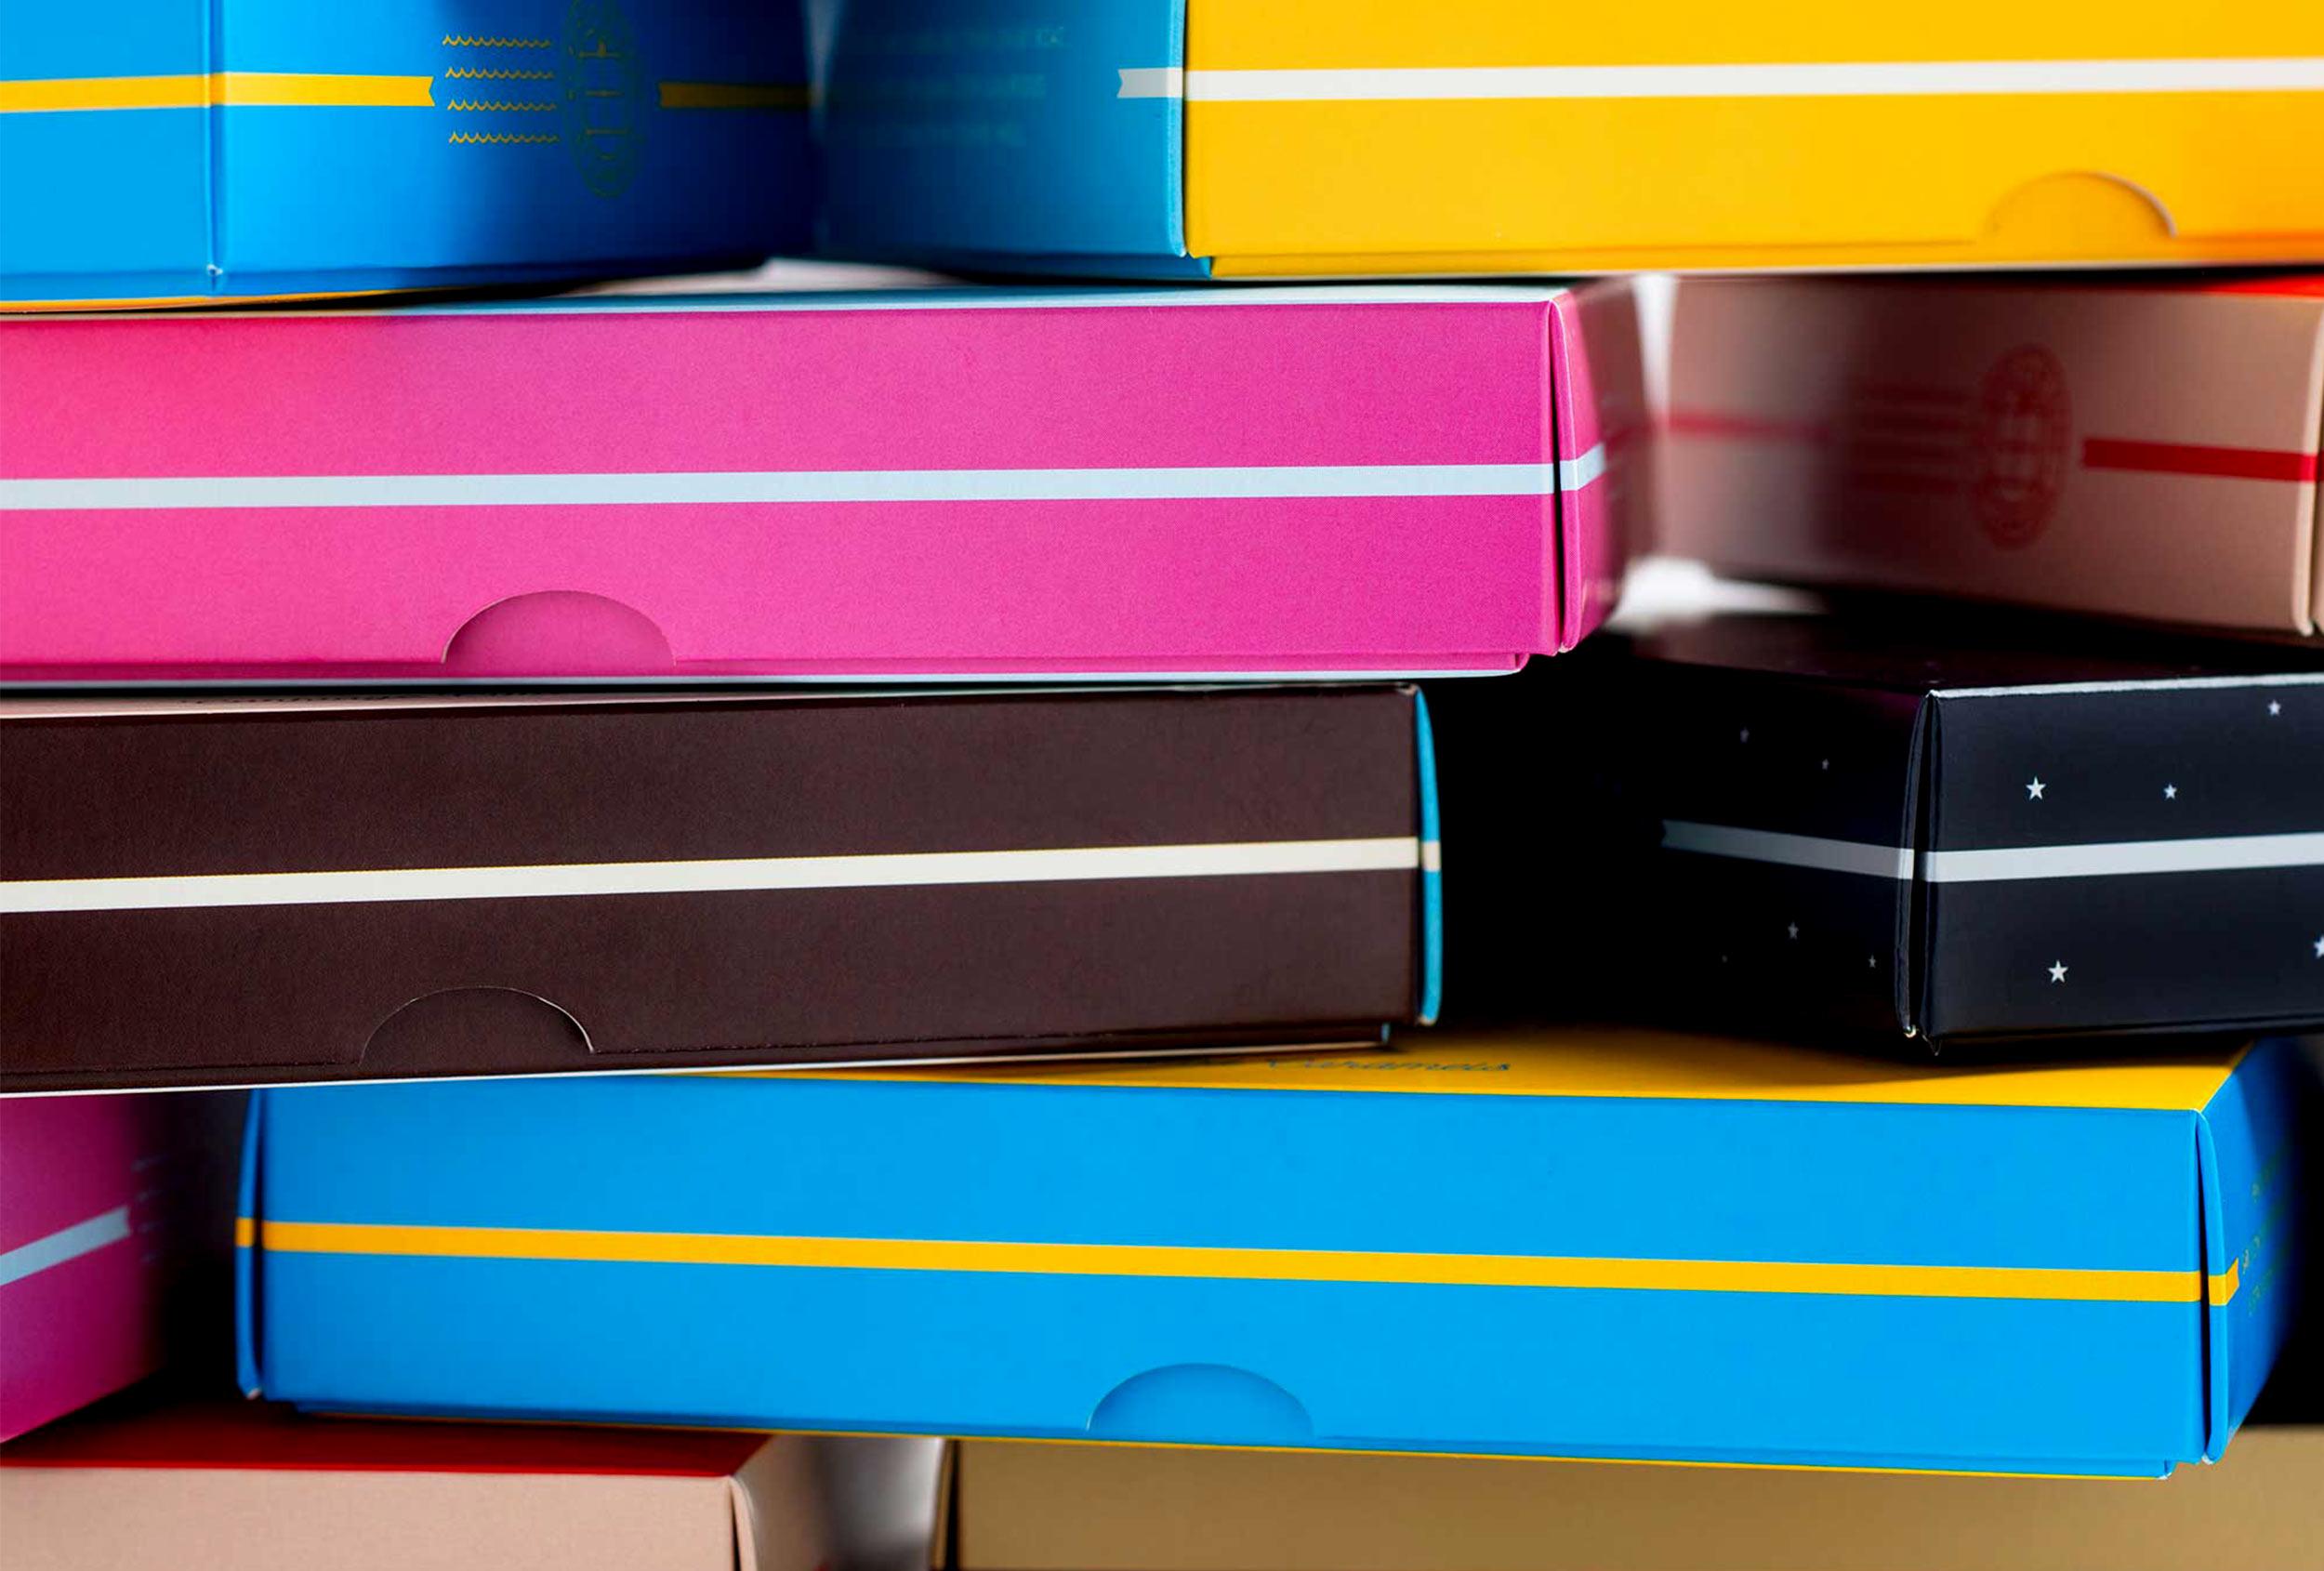 Design detail of Caragh Chocolates packaging, design by Distil Studio.